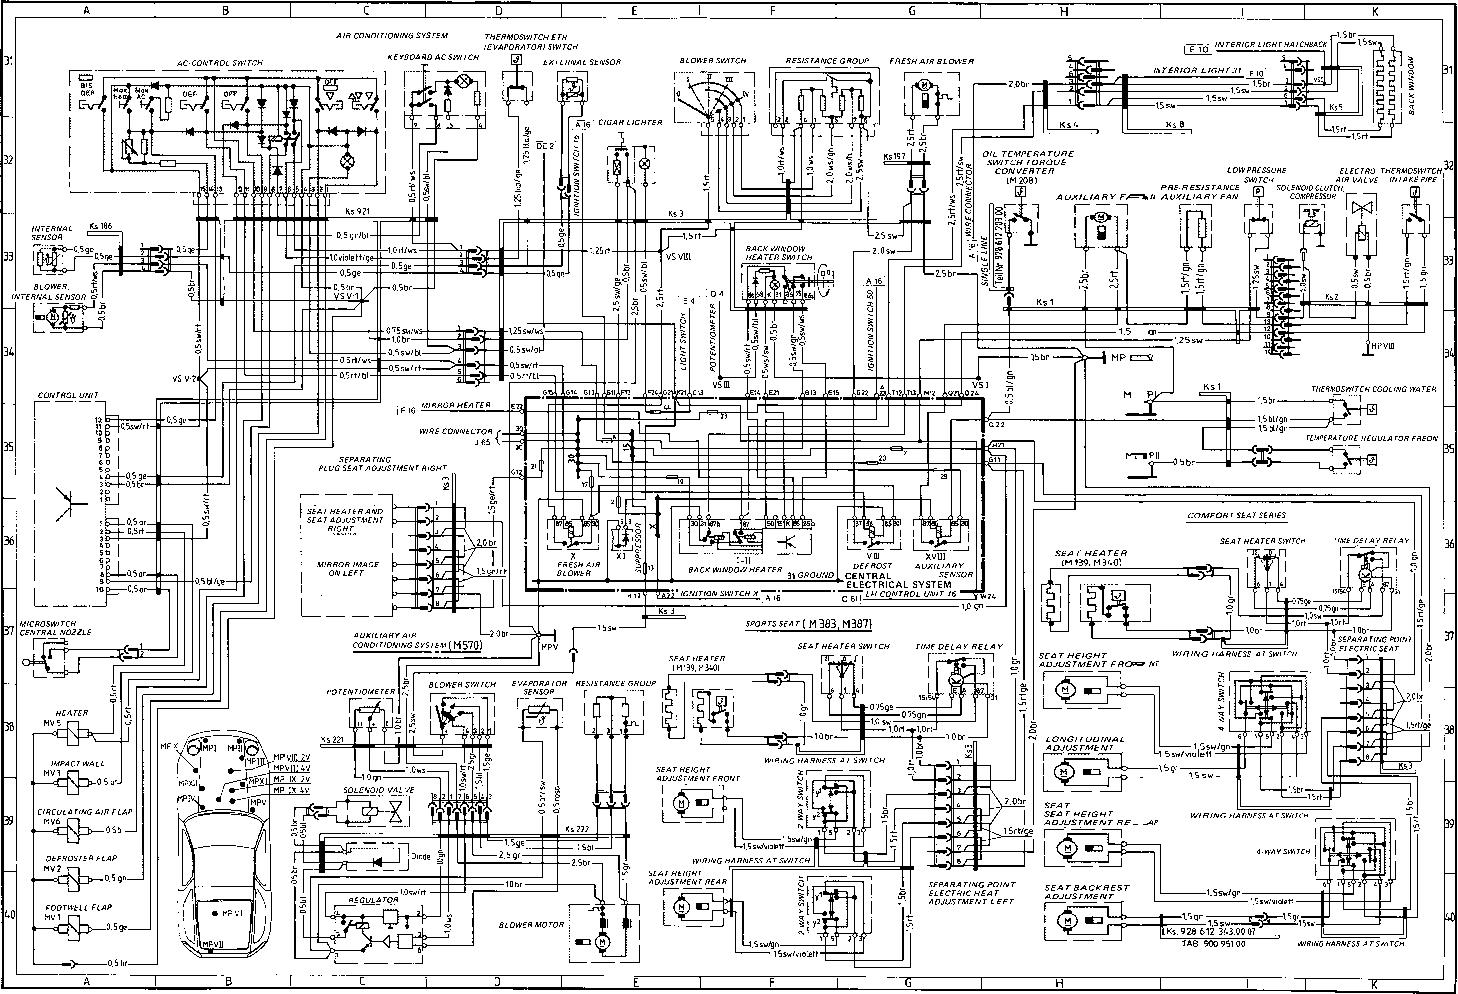 Outstanding 1985 Maserati Wiring Diagram Basic Electronics Wiring Diagram Wiring Cloud Onicaxeromohammedshrineorg